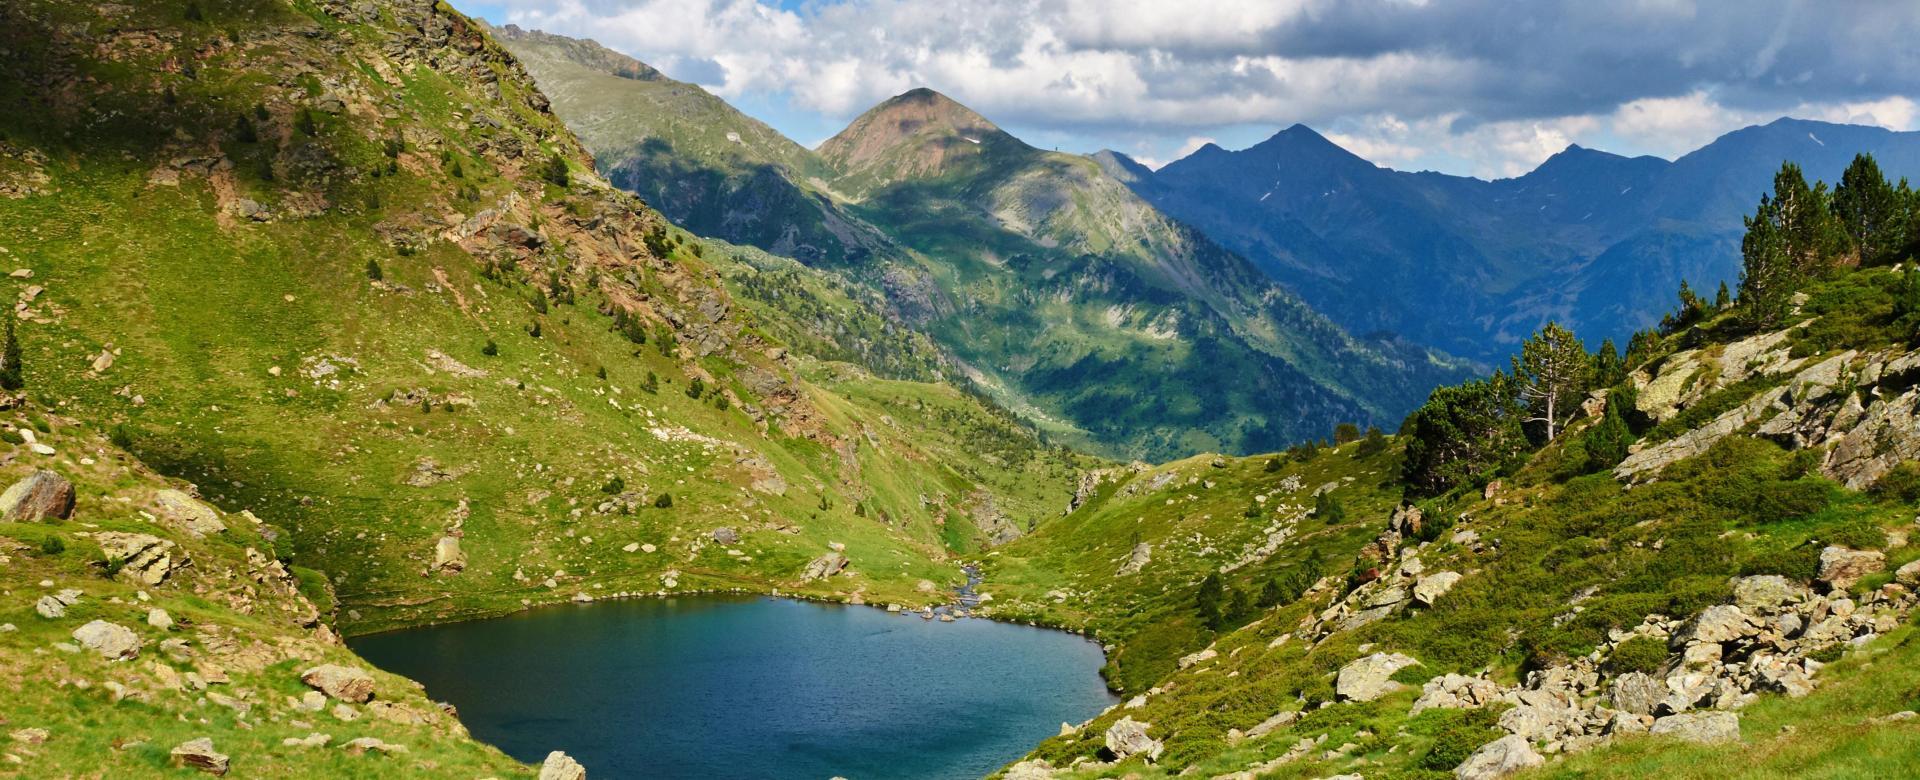 Voyage à thème : Pyrénéees : Rando-balnéo en andorre